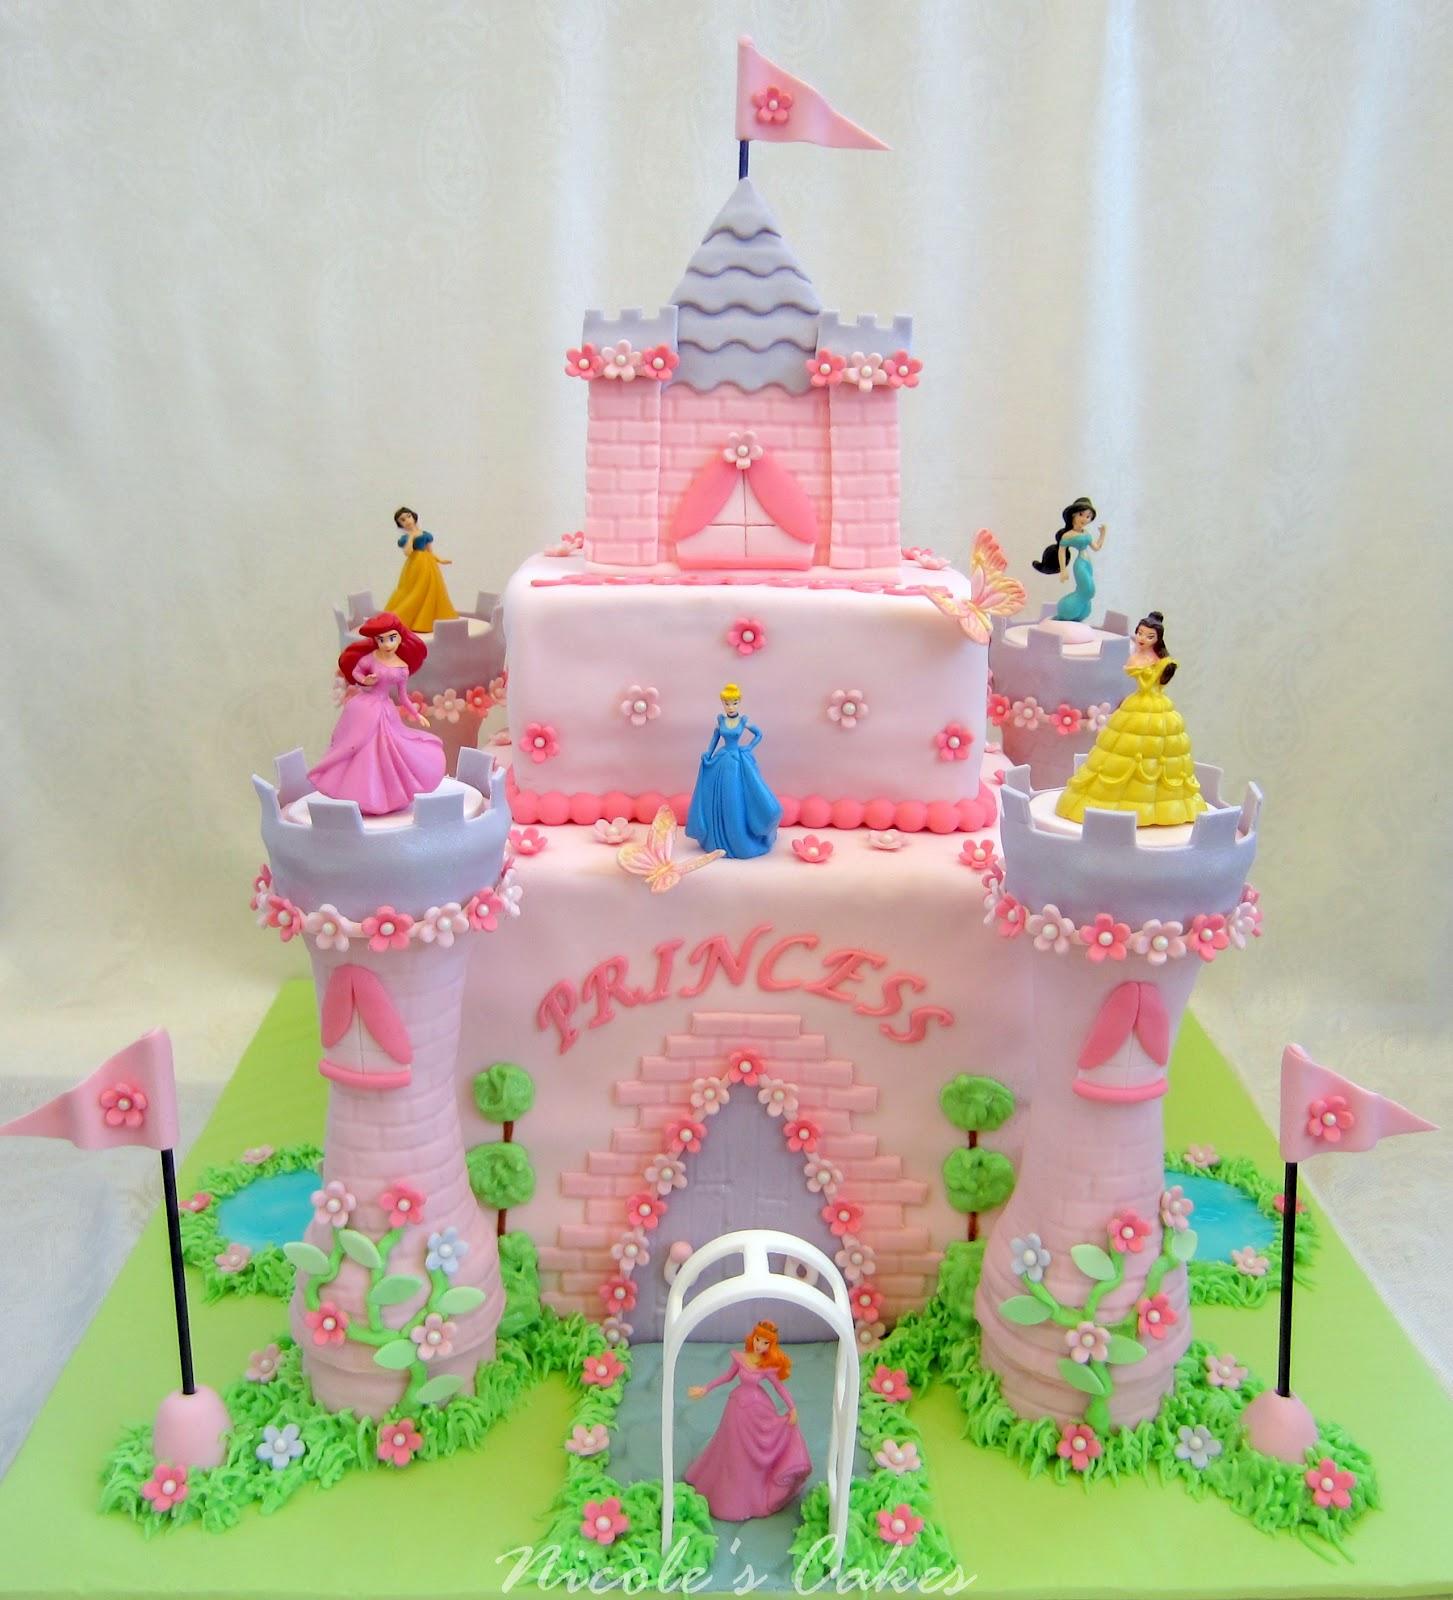 Pleasing Castle Cakes Decoration Ideas Little Birthday Cakes Birthday Cards Printable Benkemecafe Filternl